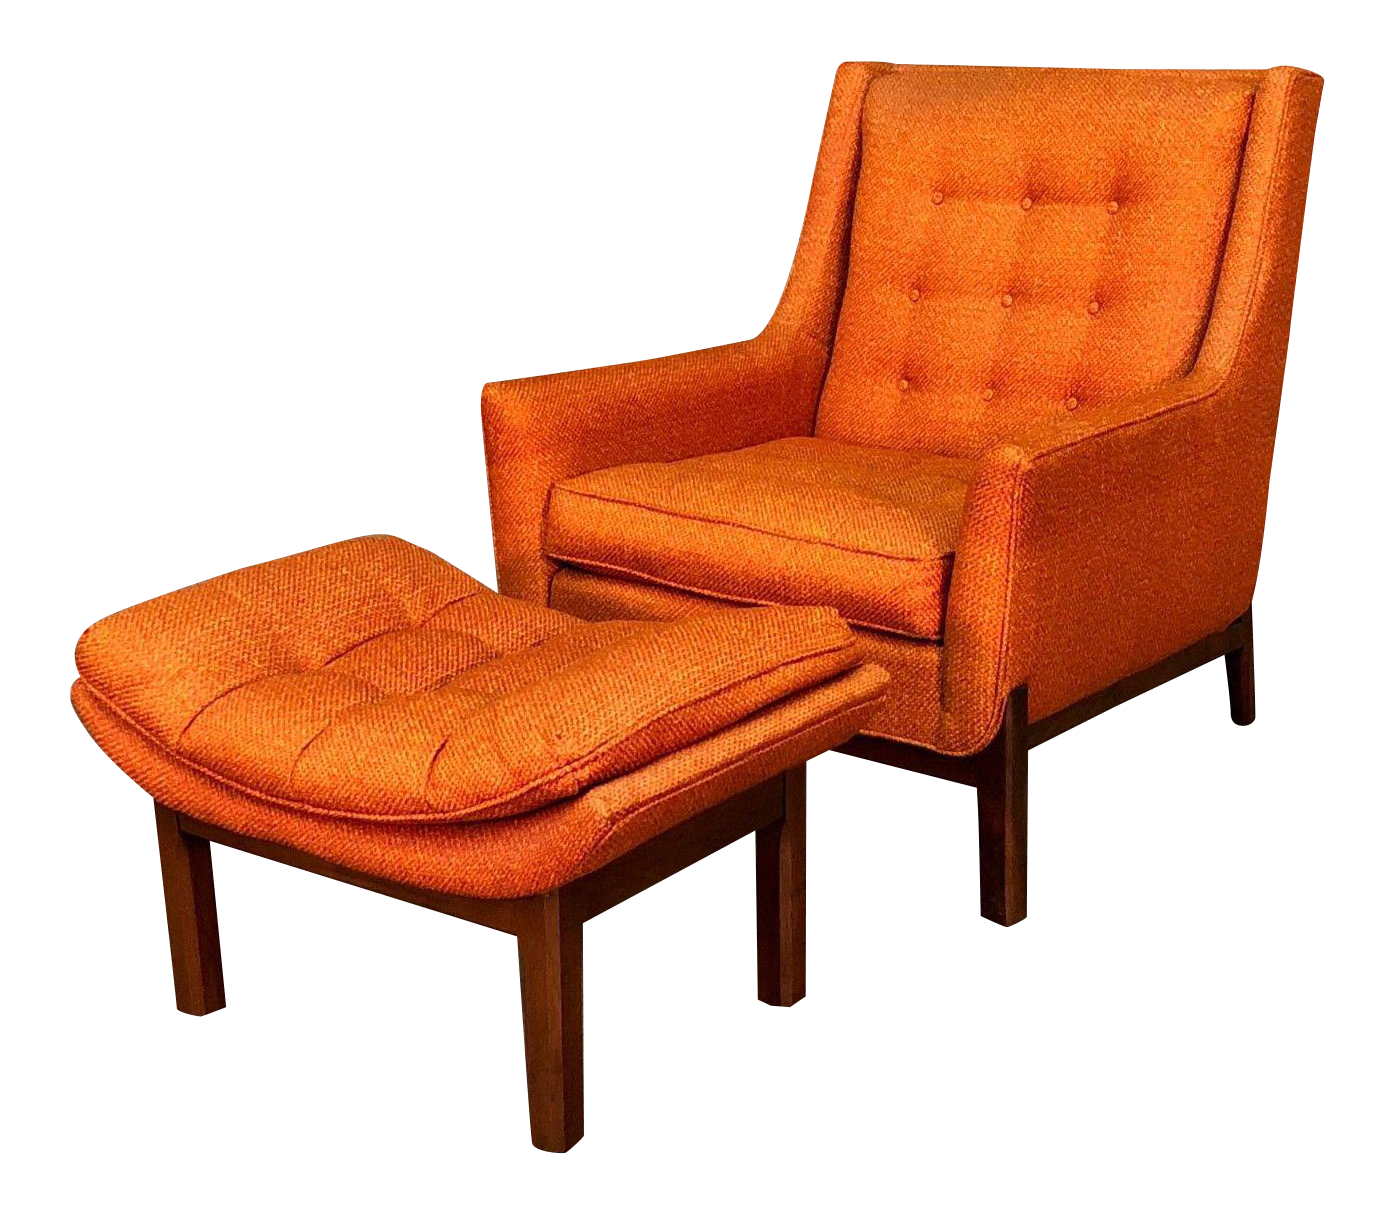 Awesome Rowe Orange Tweed Mid Century Modern Lounge Chair With Ottoman